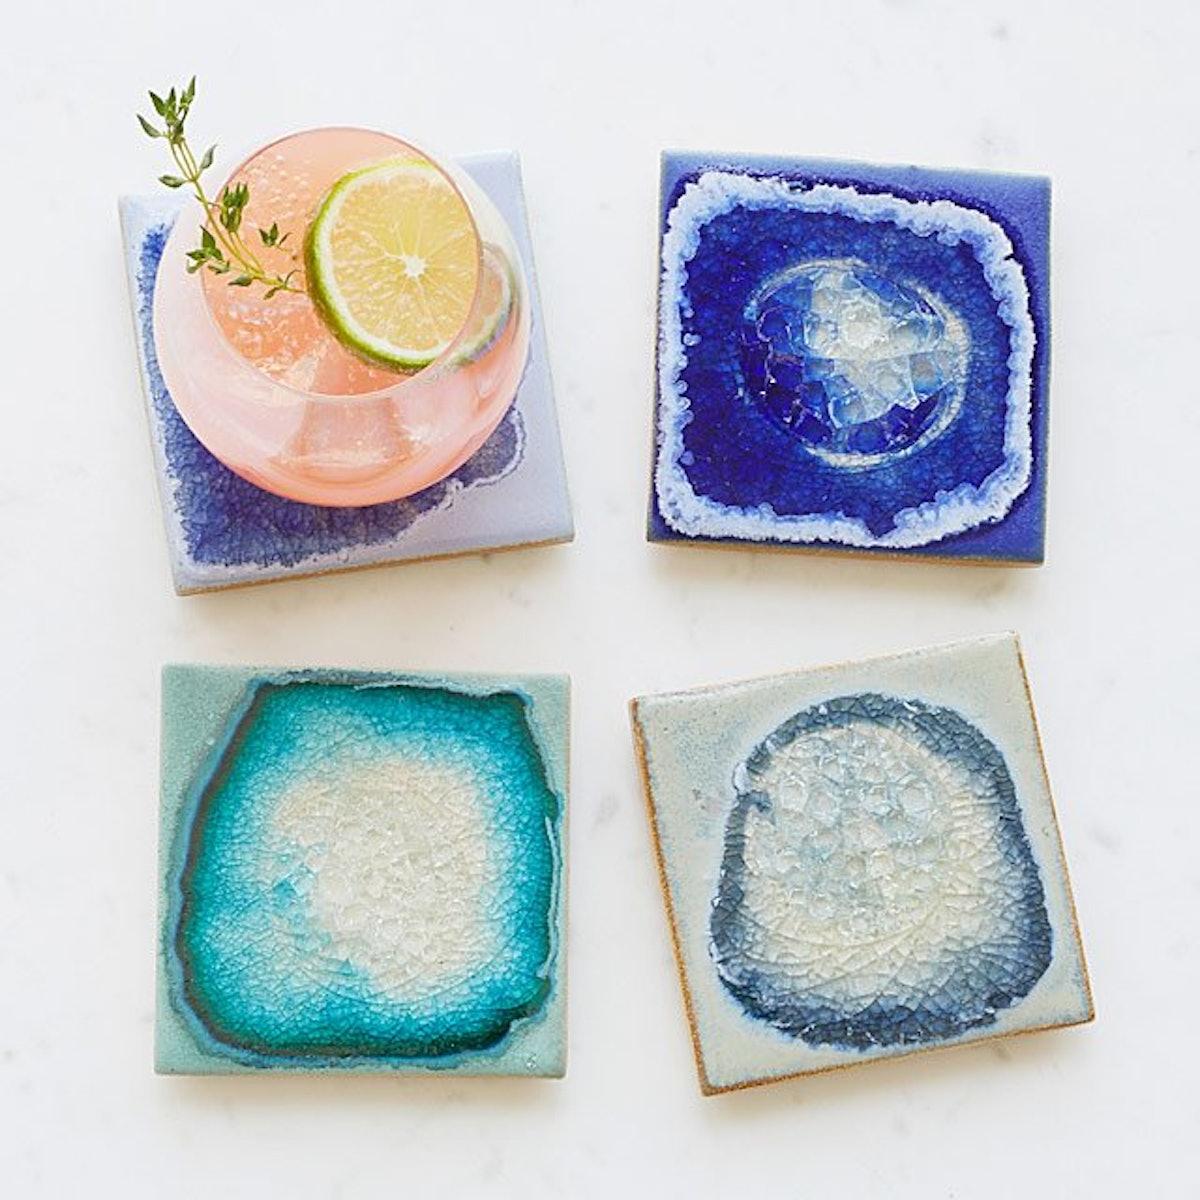 Stoneware and Crackled Glass Coaster Set